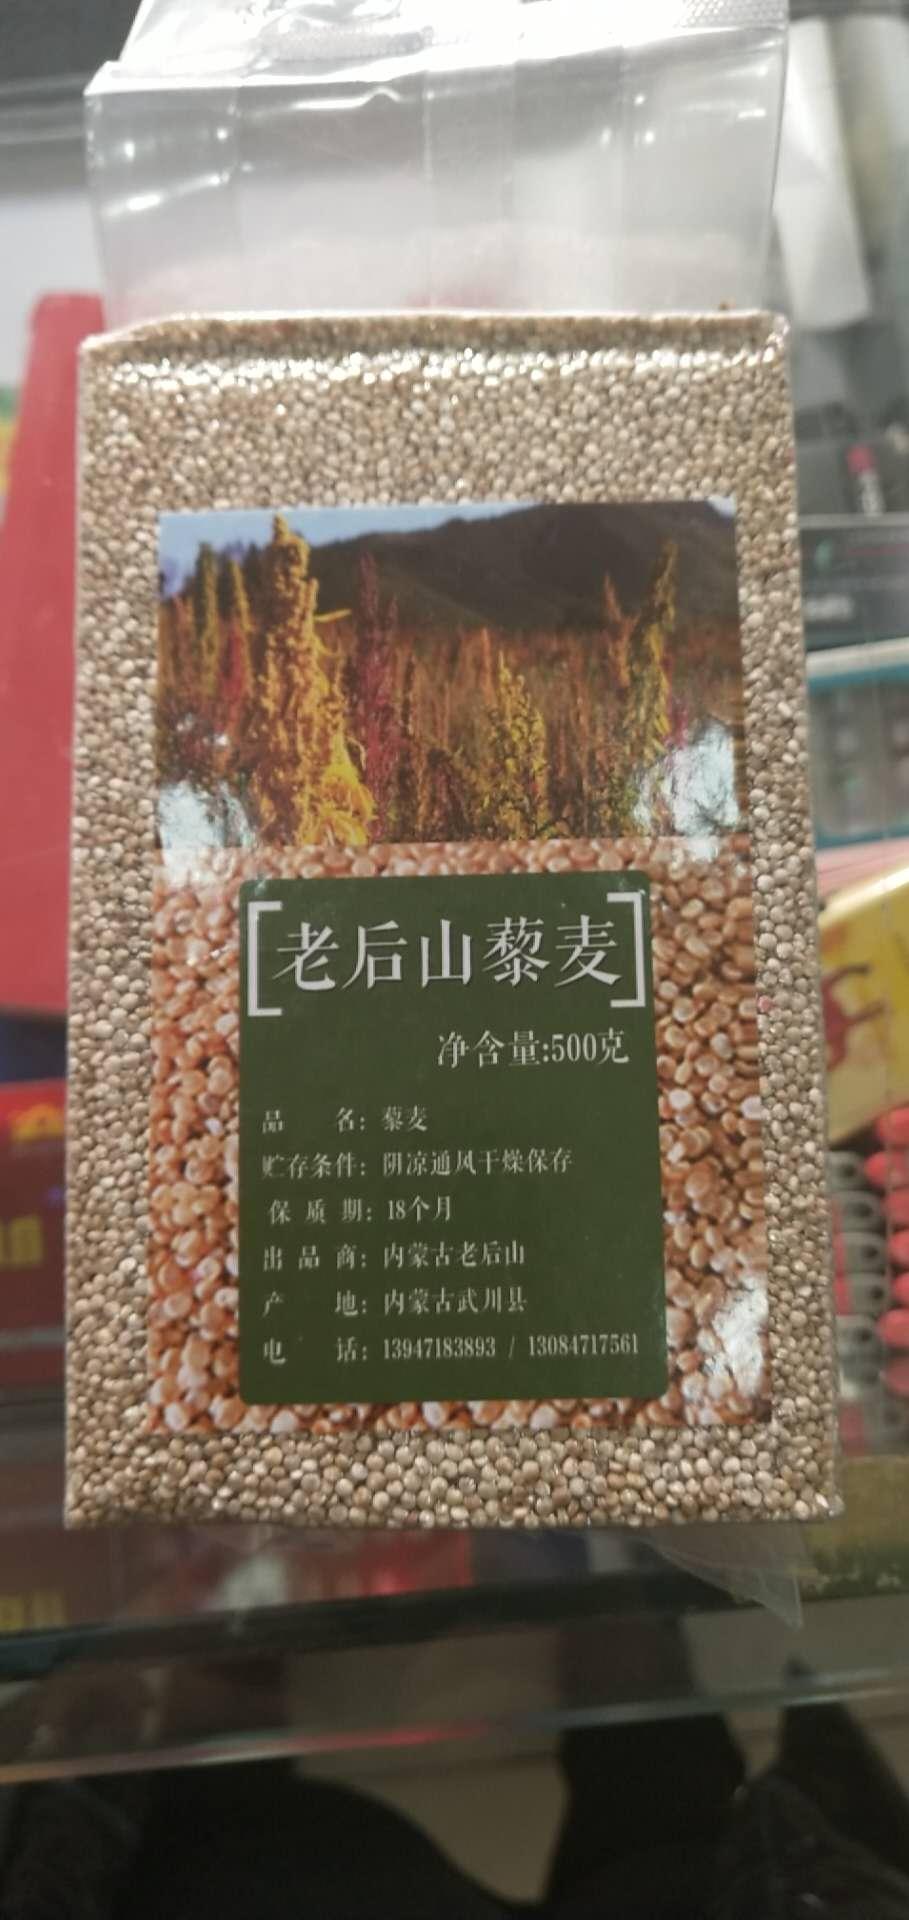 藜麦【老后山】